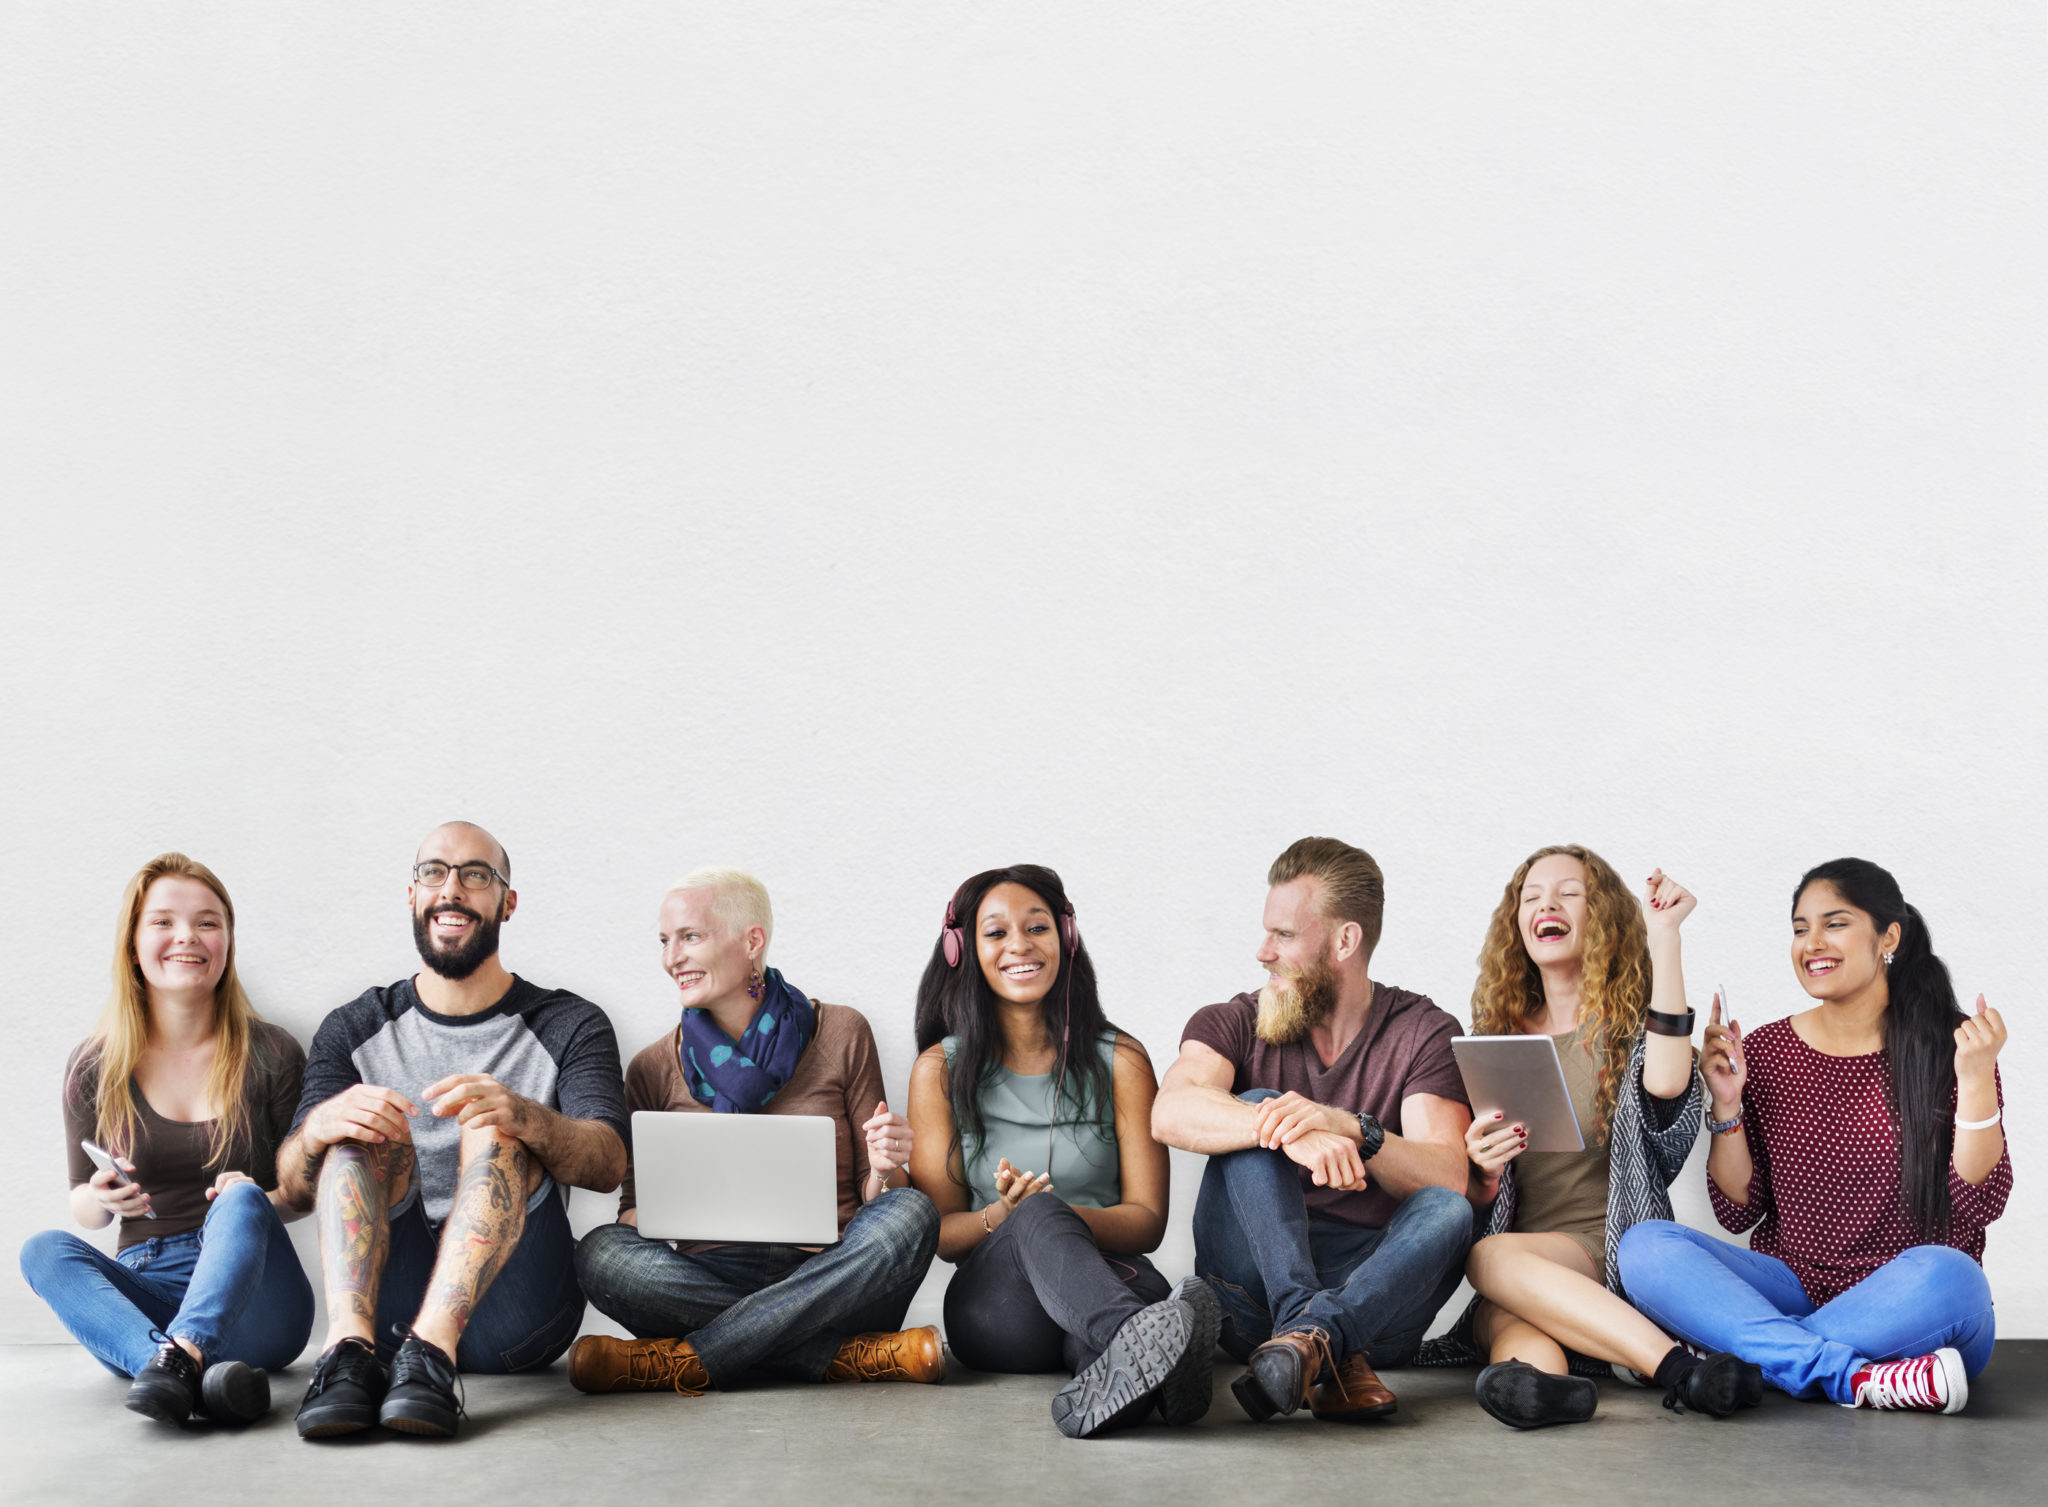 bigstock-Diverse-Group-of-People-Commun-173745077